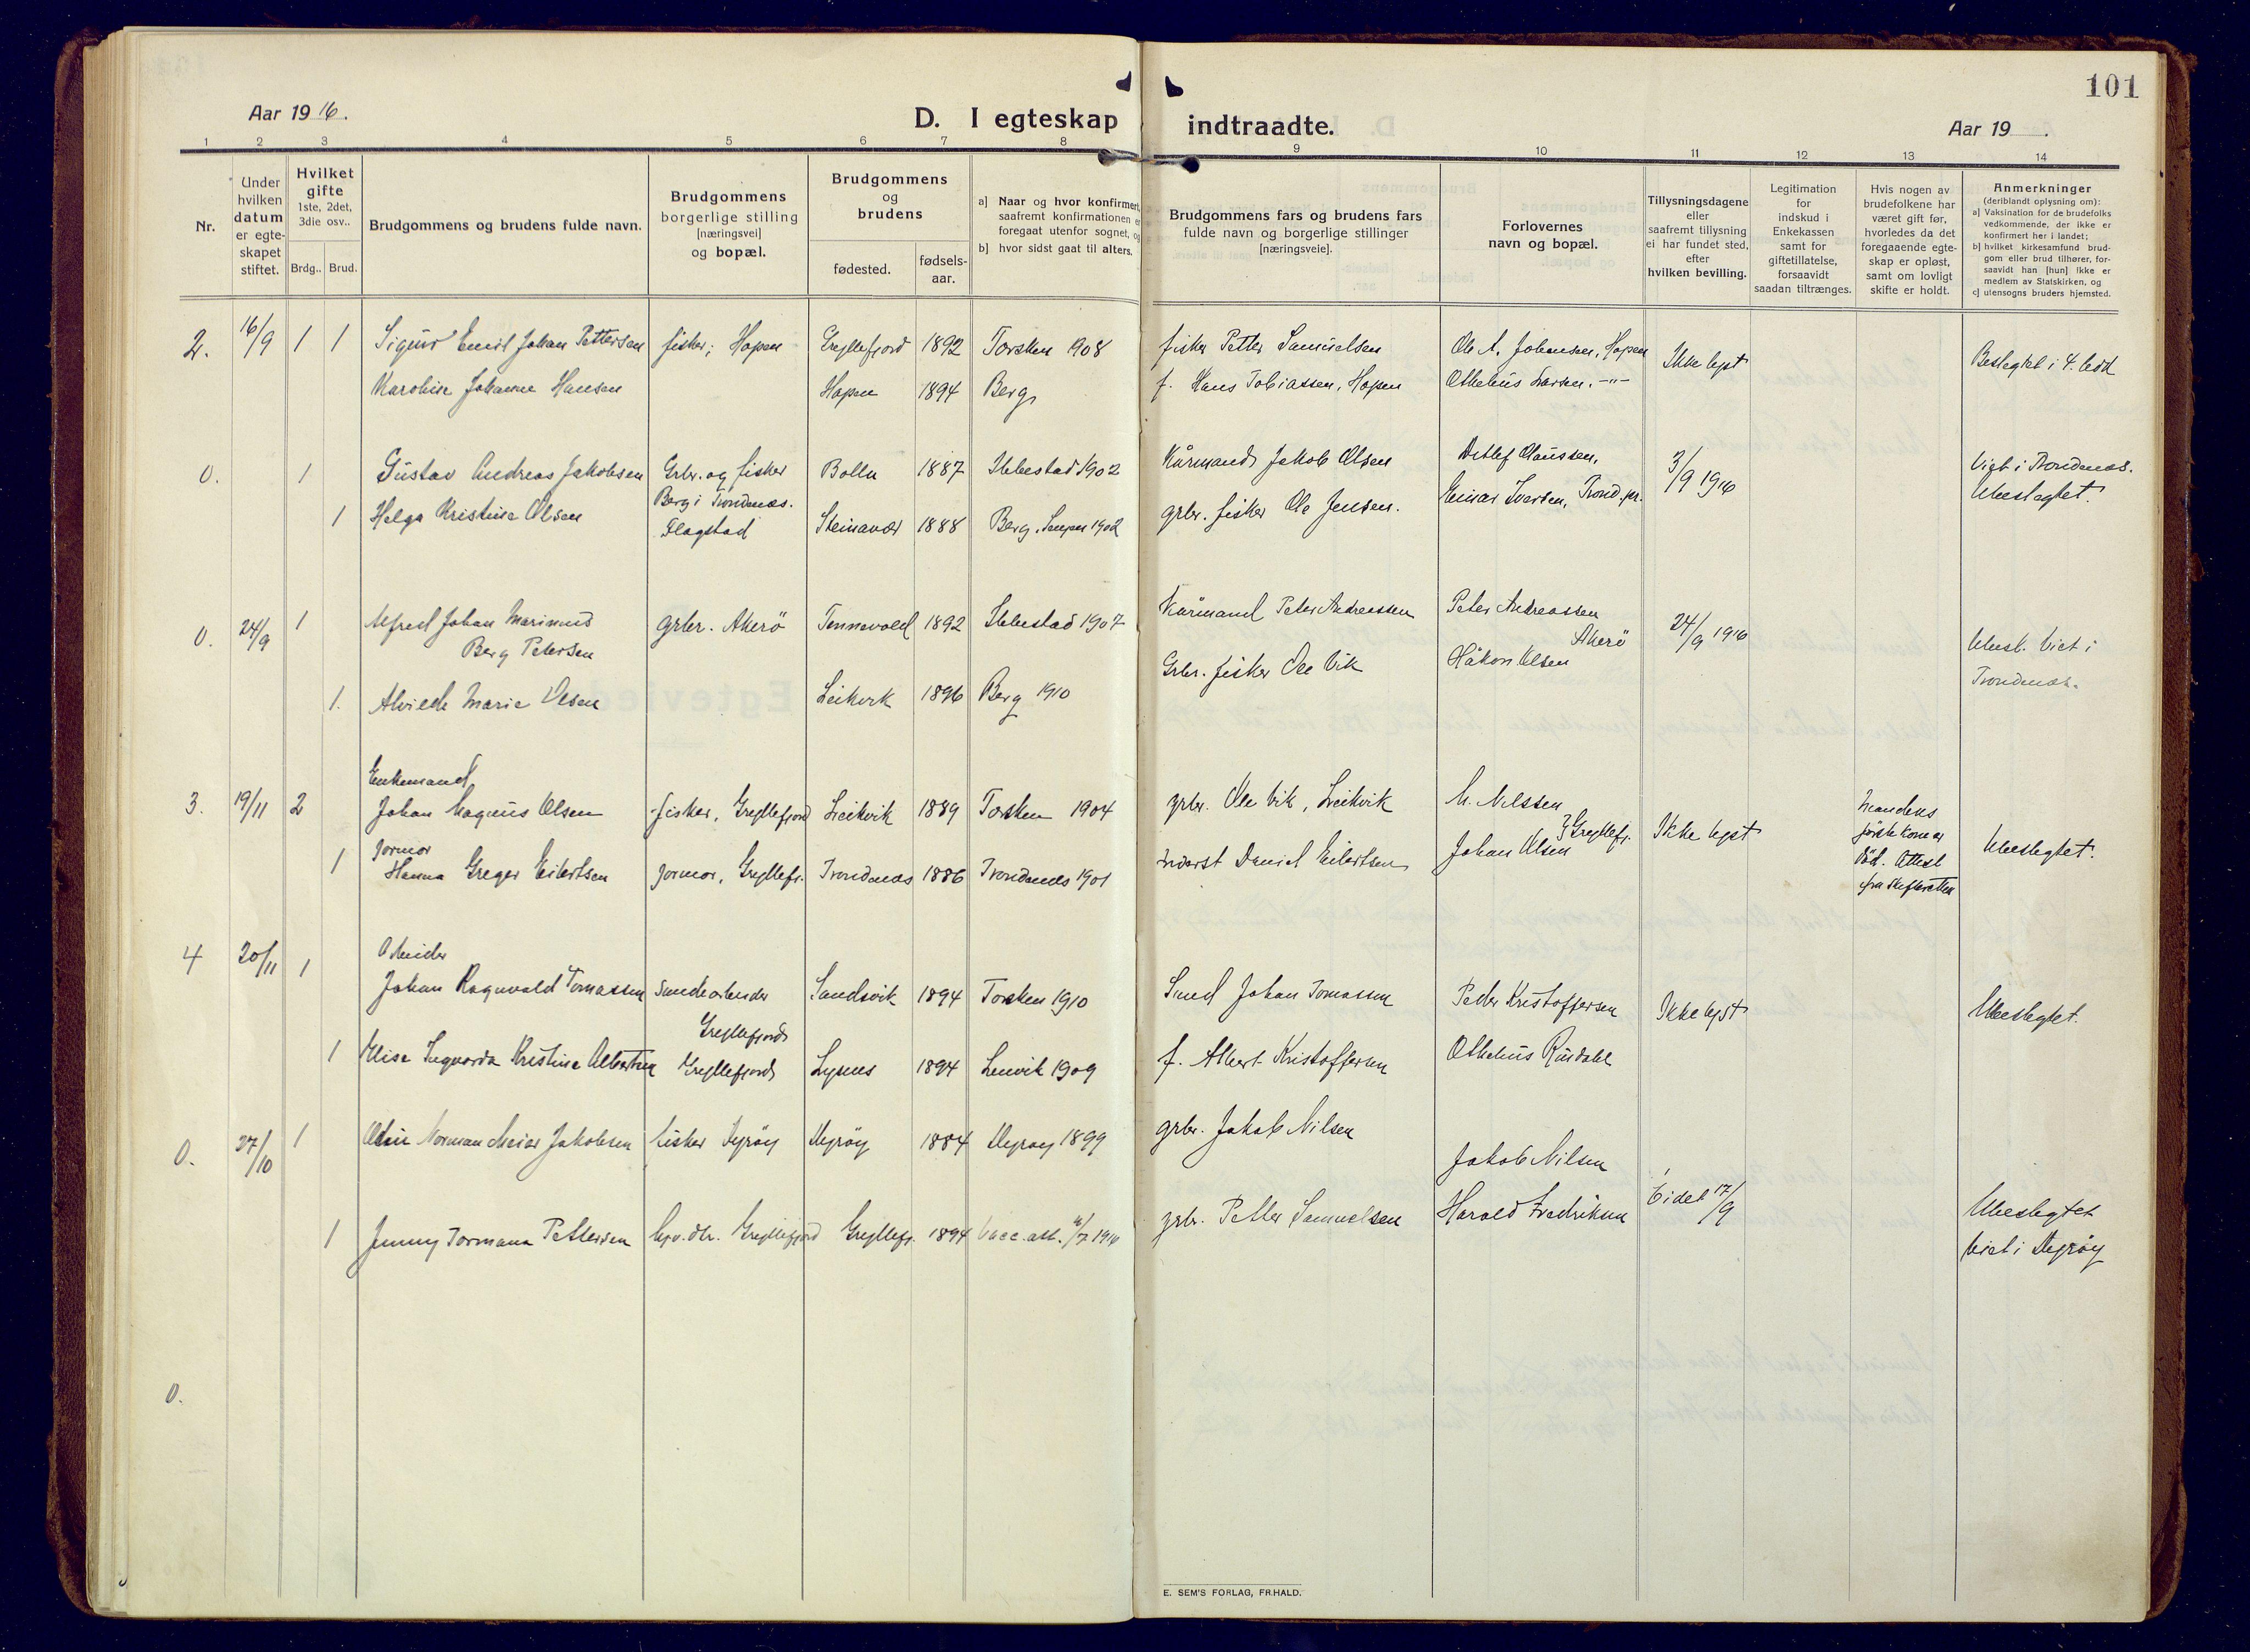 SATØ, Mefjord/Berg sokneprestkontor, G/Ga/Gaa: Ministerialbok nr. 10, 1916-1928, s. 101